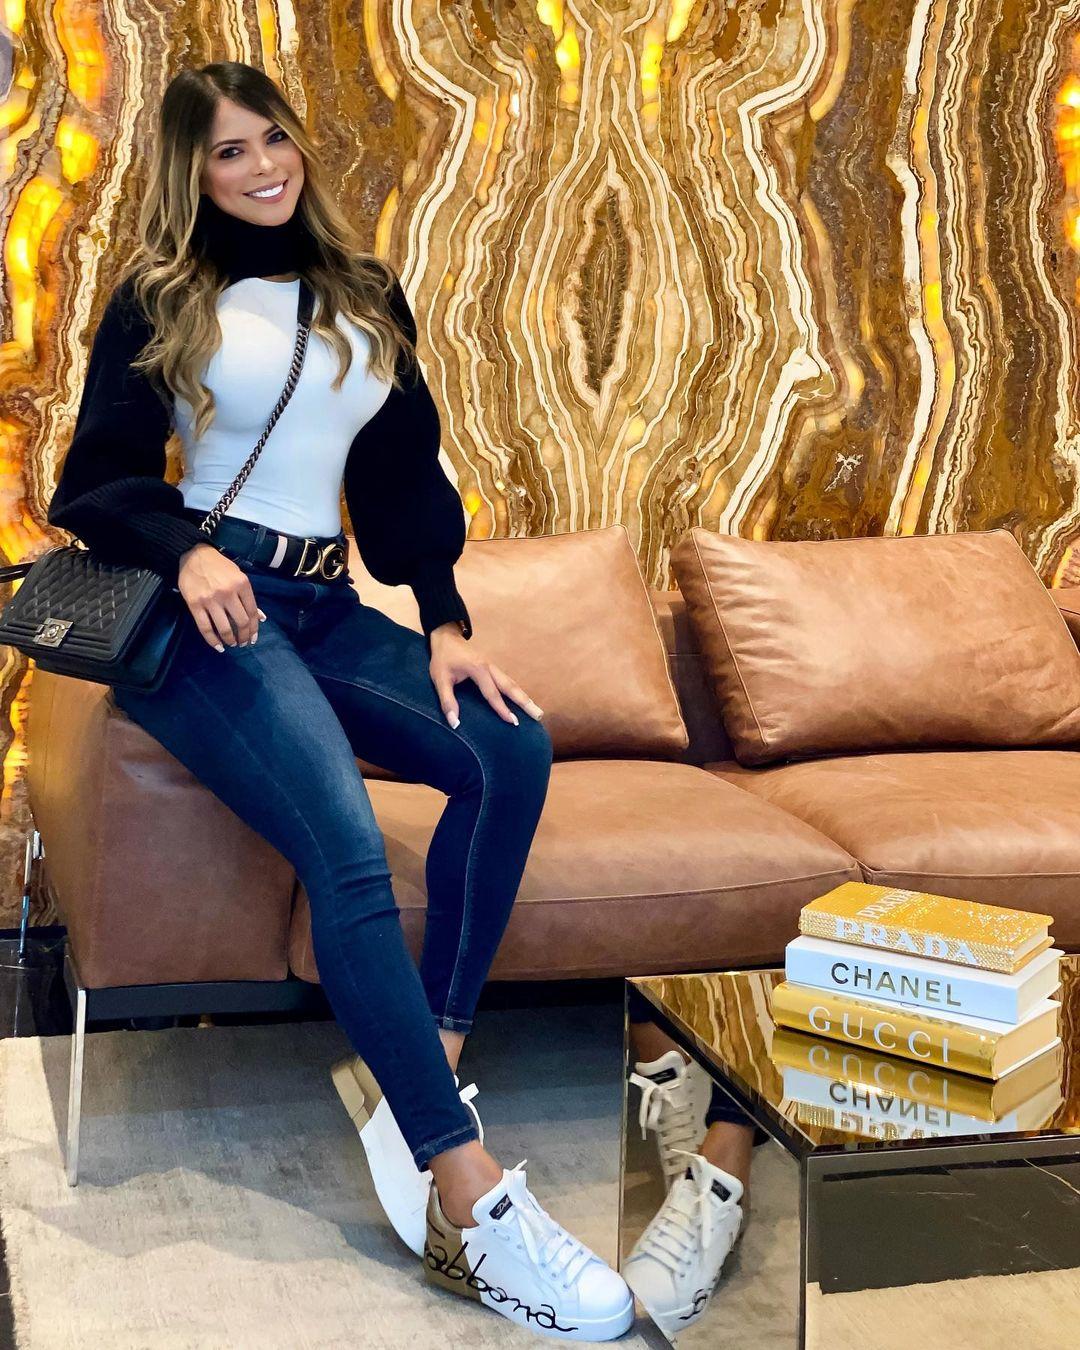 Jennifer-Giraldino-Wallpapers-Insta-Fit-Bio-2